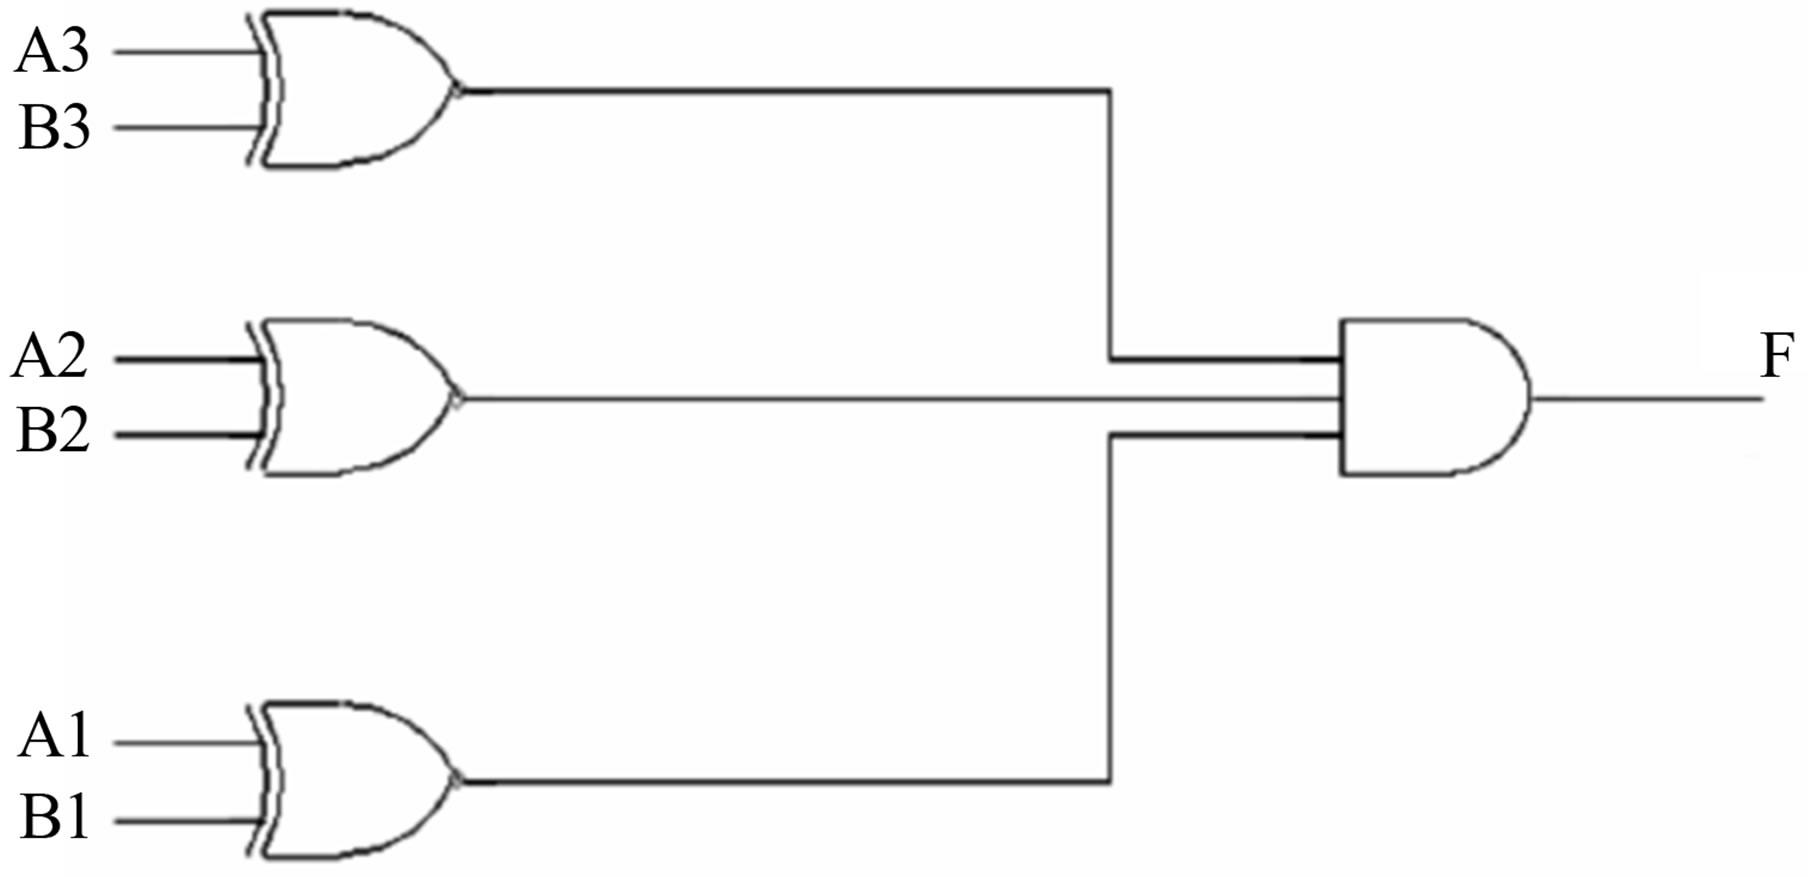 8 bit magnitude comparator logic diagram kicker kisloc wiring driverlayer search engine